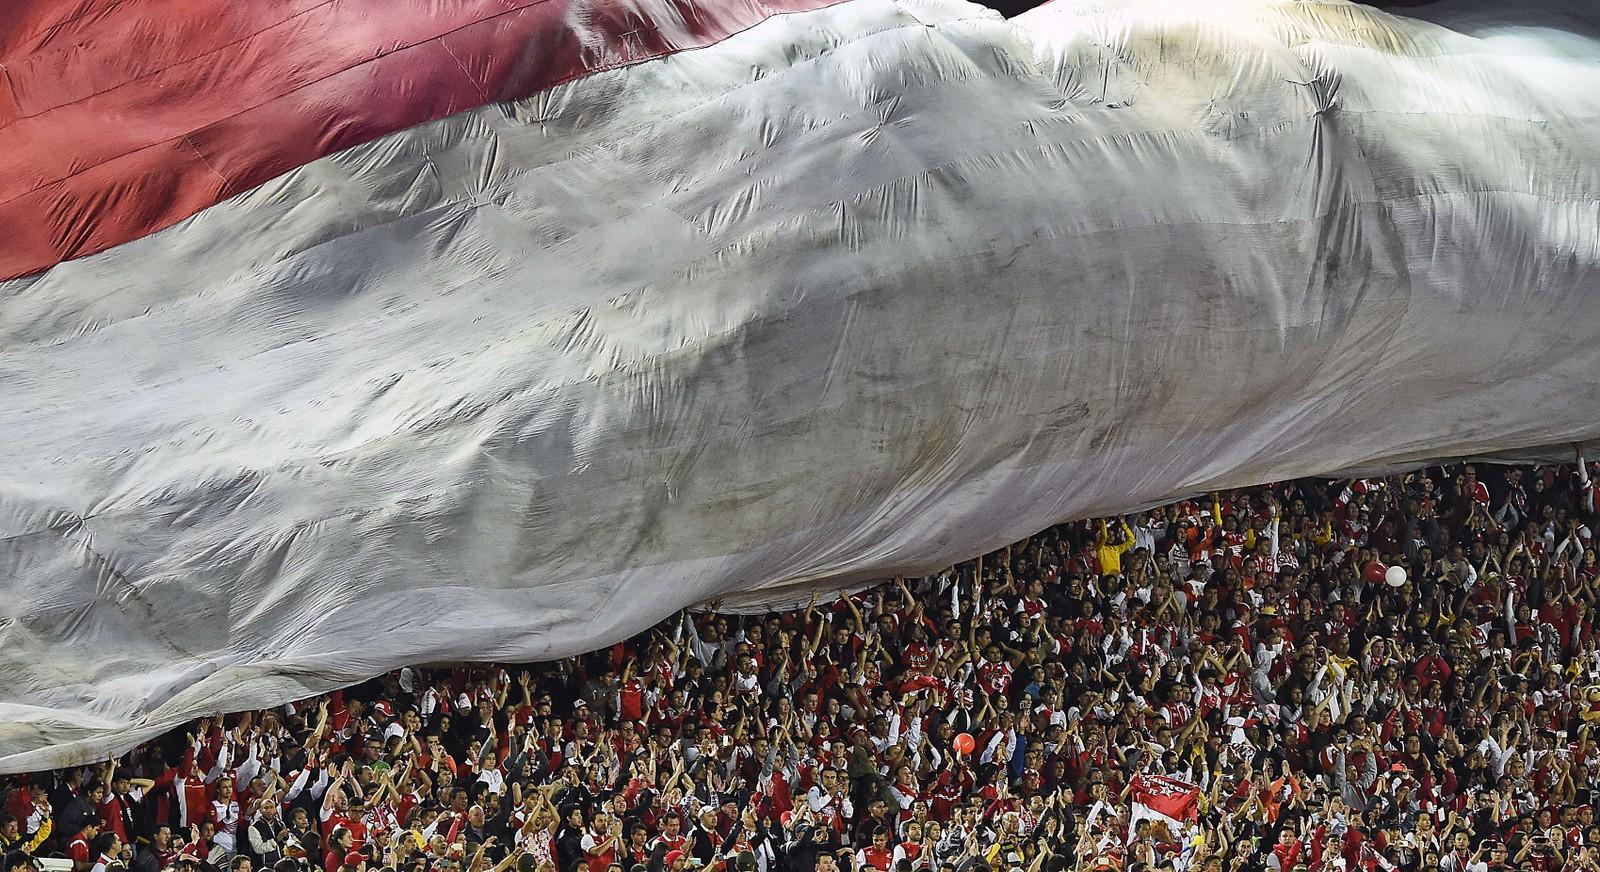 Colomibianske Santa Fe-fans feirer seieren mot argentinske Indepediente på hjemmebane under Sudamericana Cup.